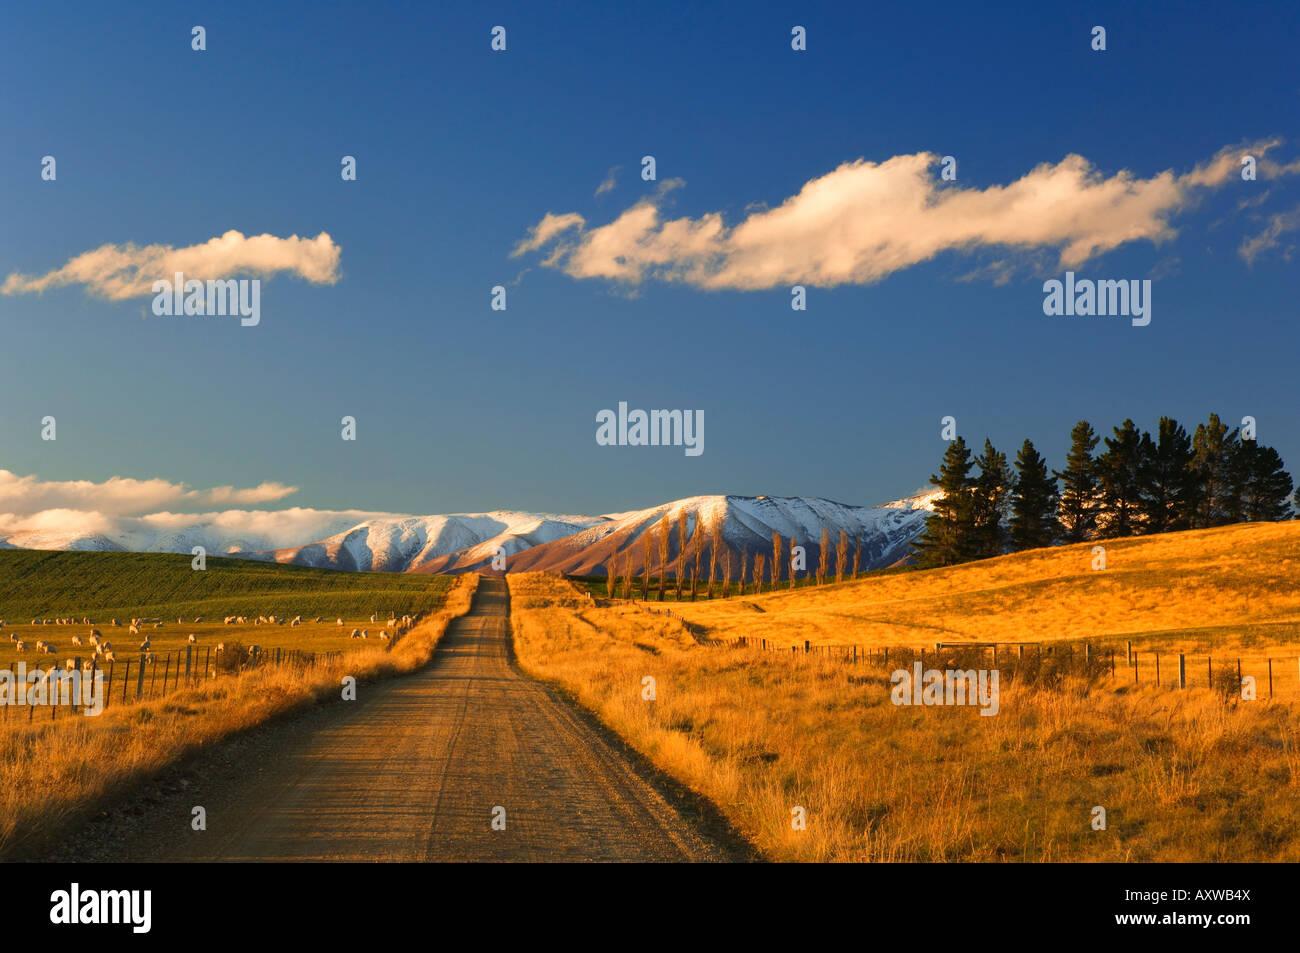 Gravel road and Hawkdun Range, Ranfurly, Central Otago, South Island, New Zealand, Pacific - Stock Image